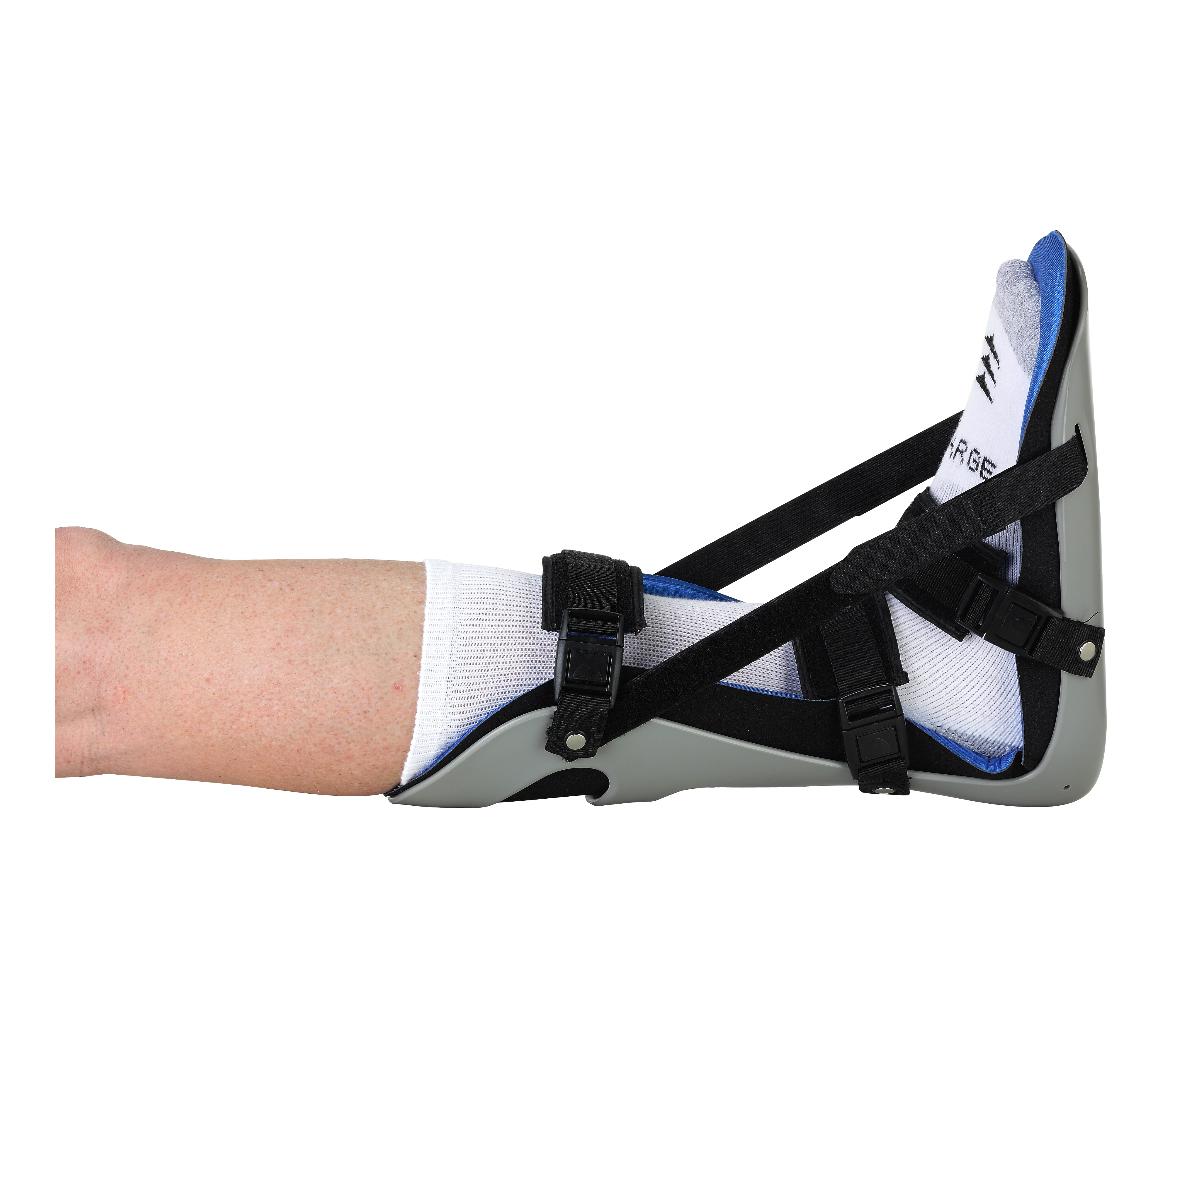 Image Of Formfit Night Splint with Slip-Resistant Tread, Medium